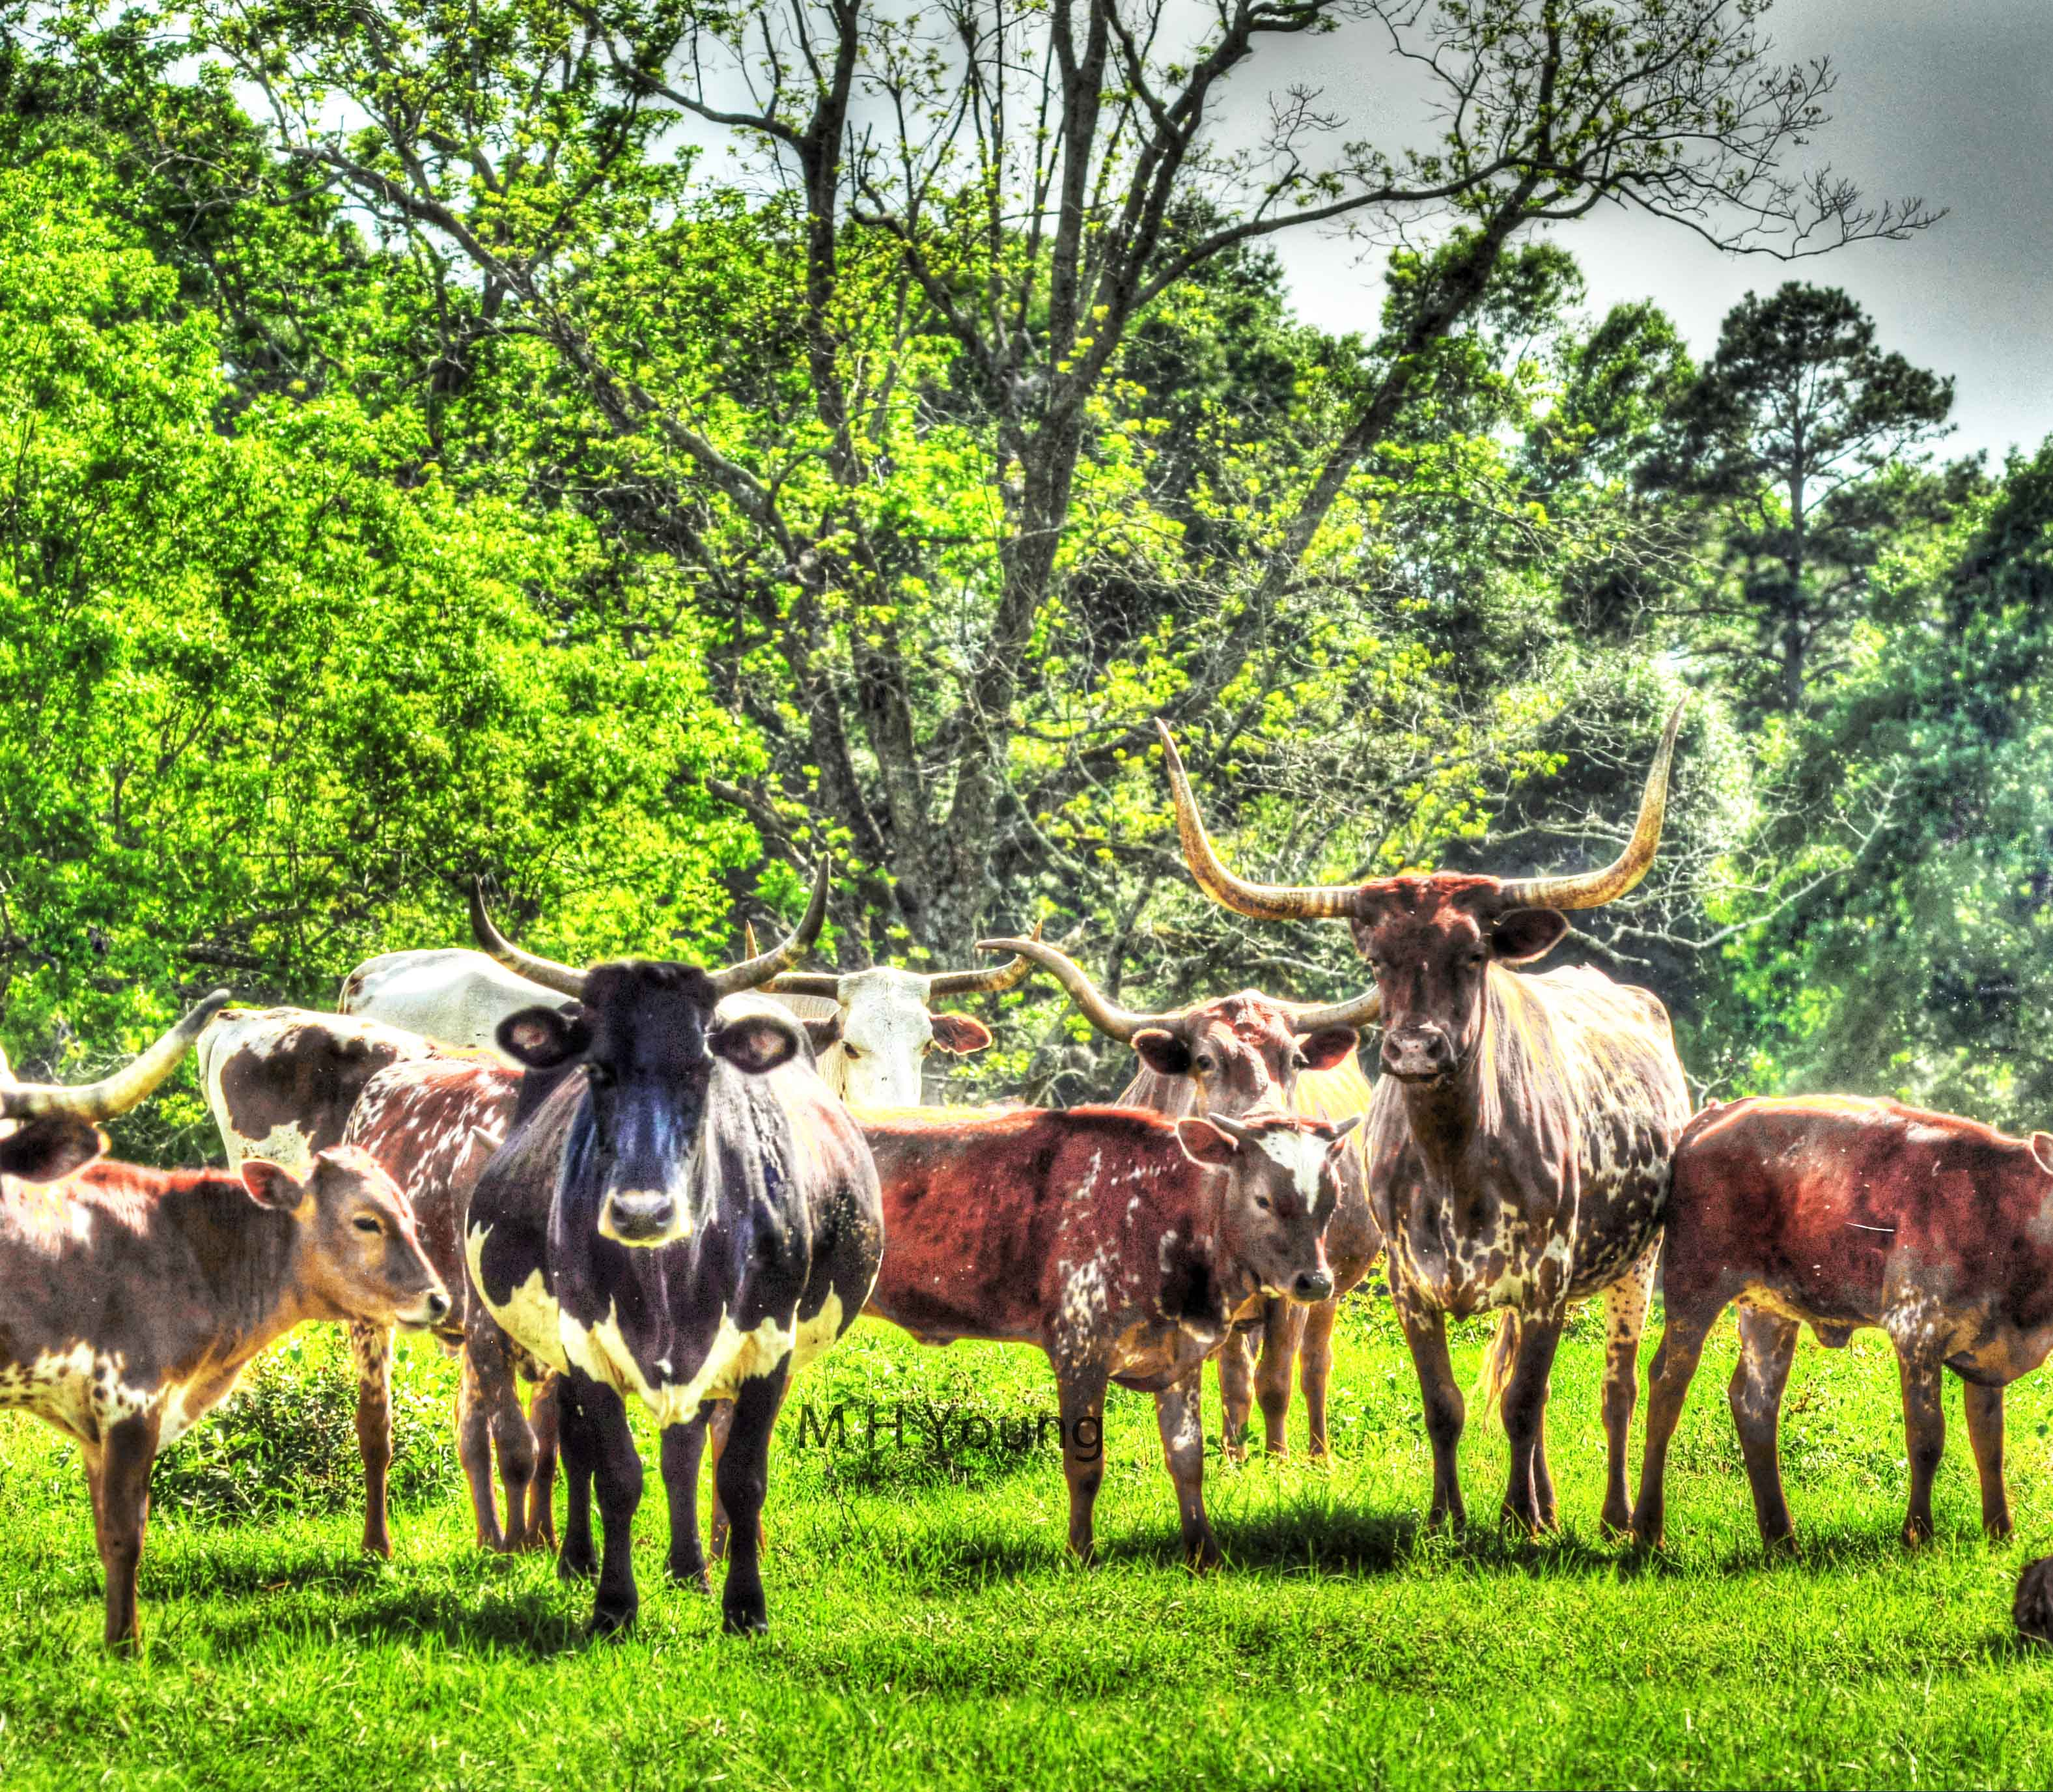 Cows 34_5_6 ldi W M.jpg